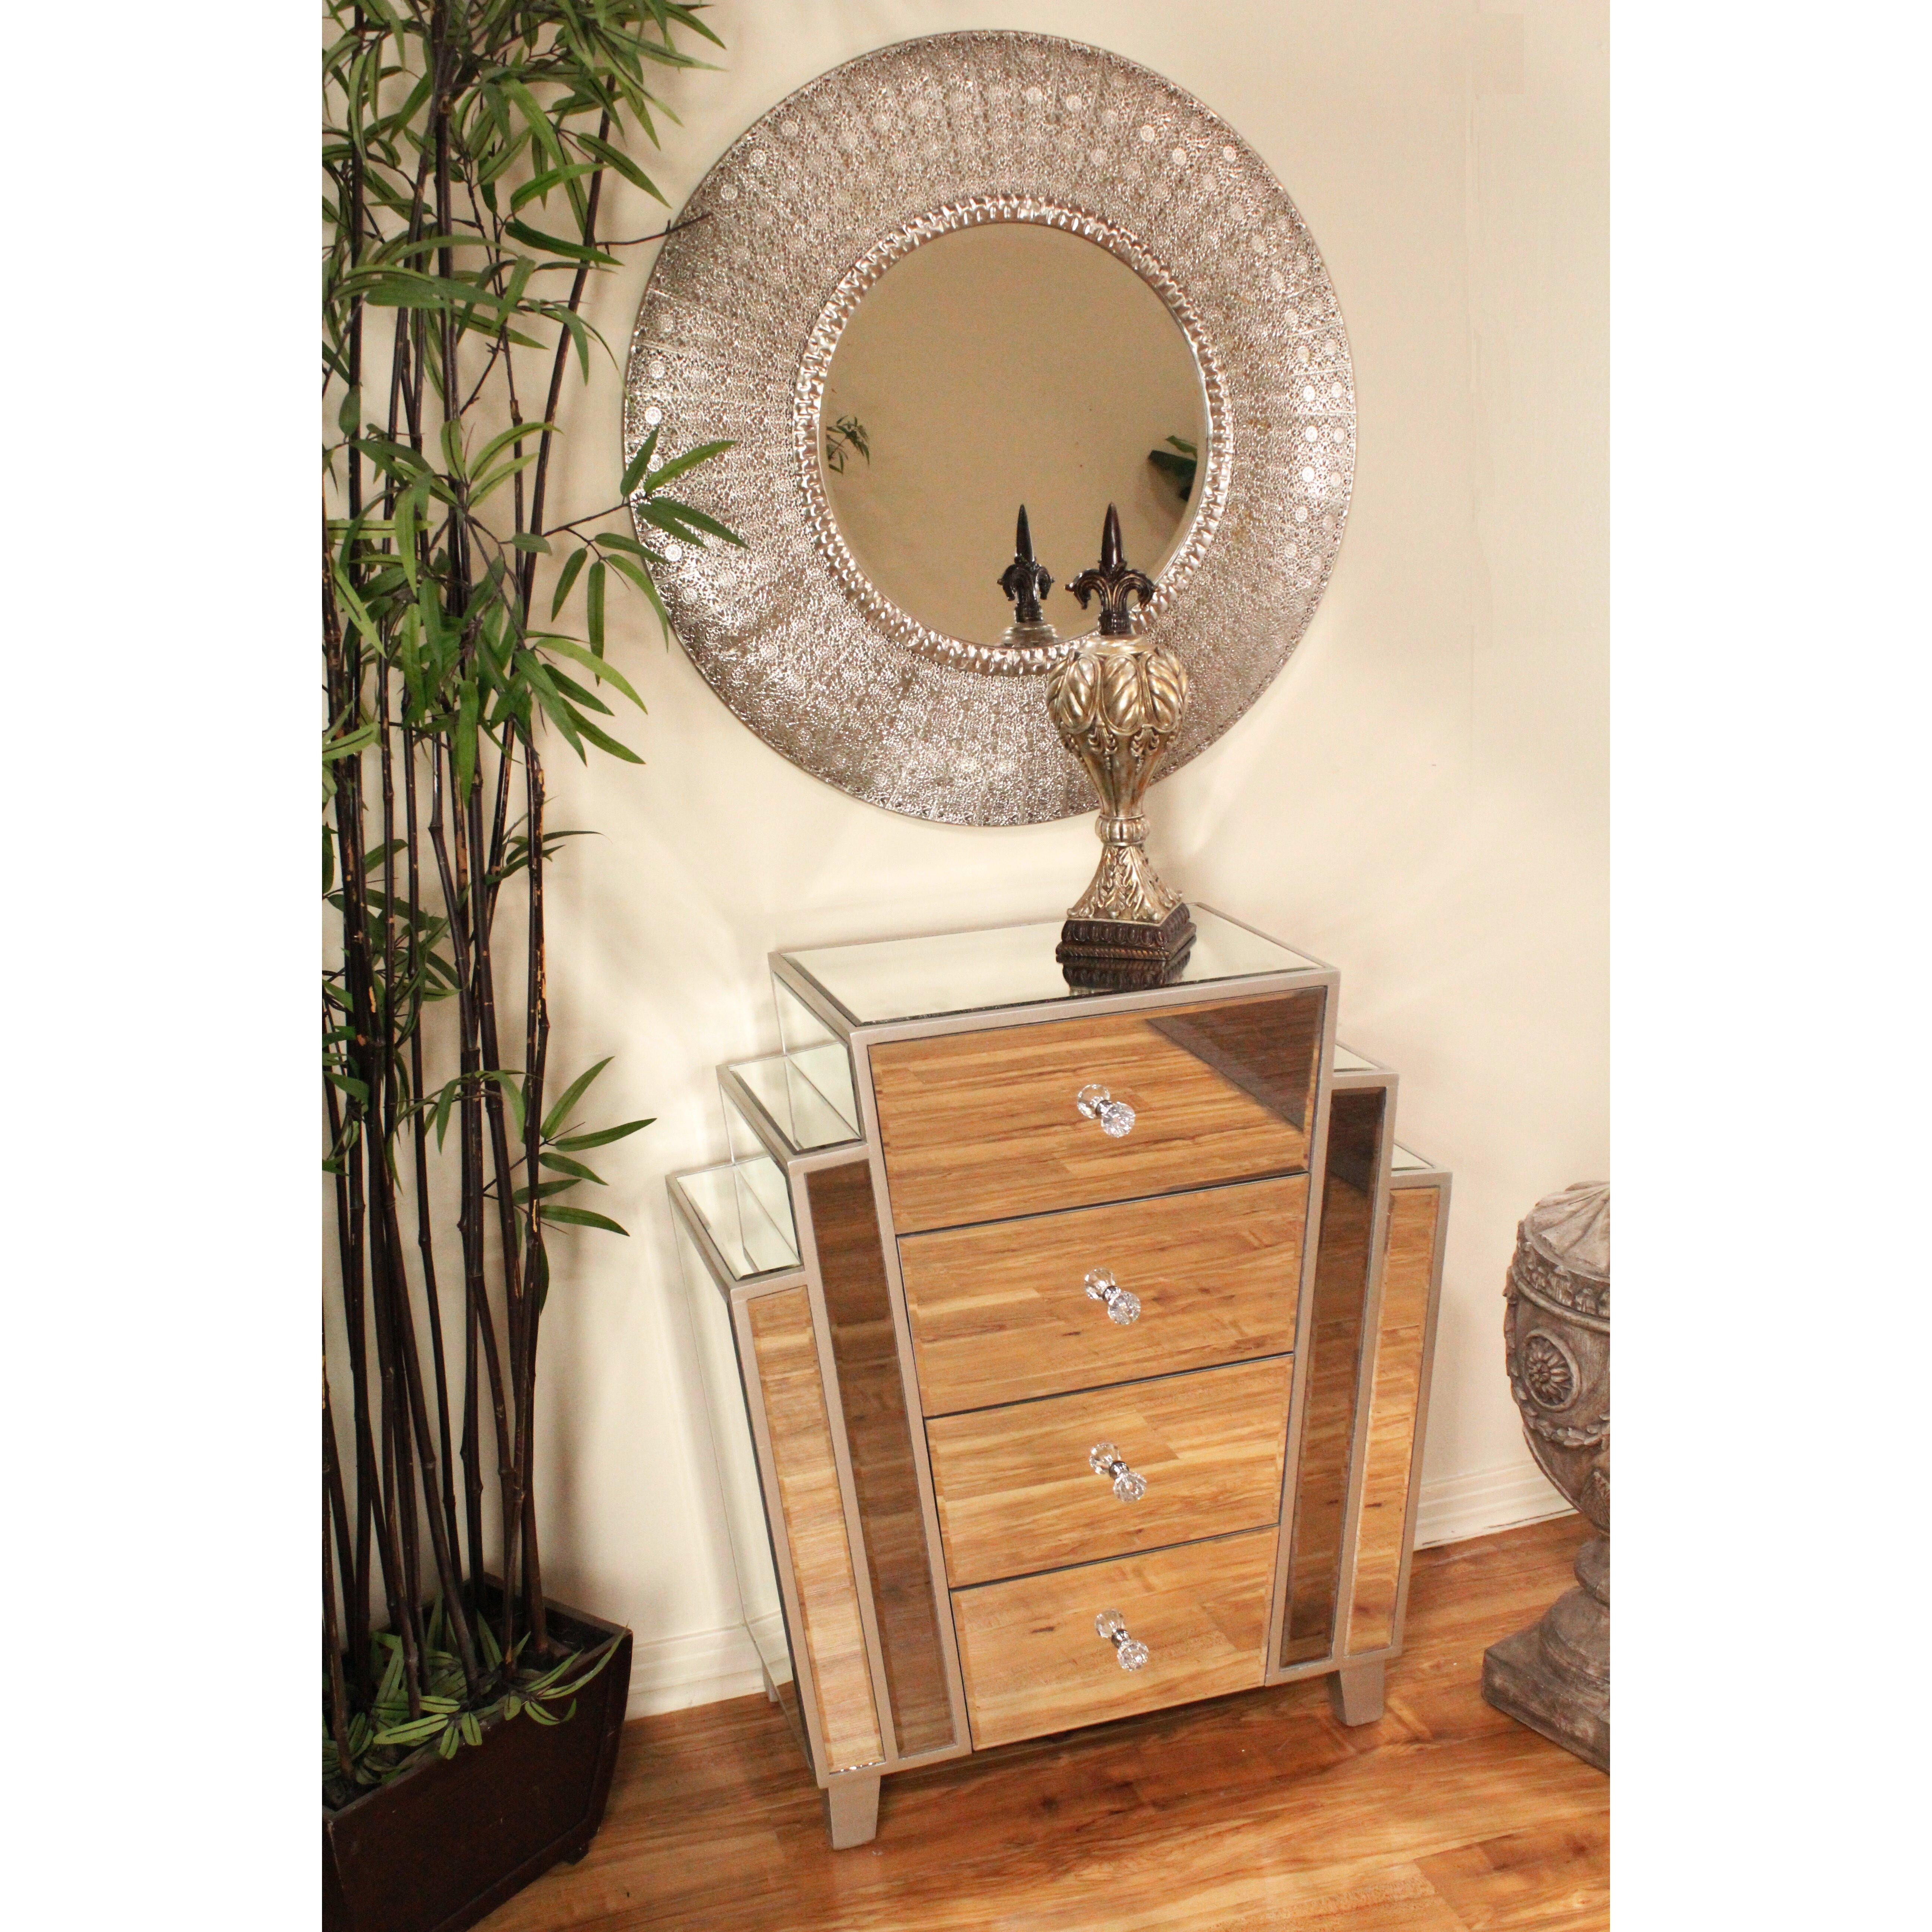 Heather Ann Marquee Art Decor Cabinet Wayfair